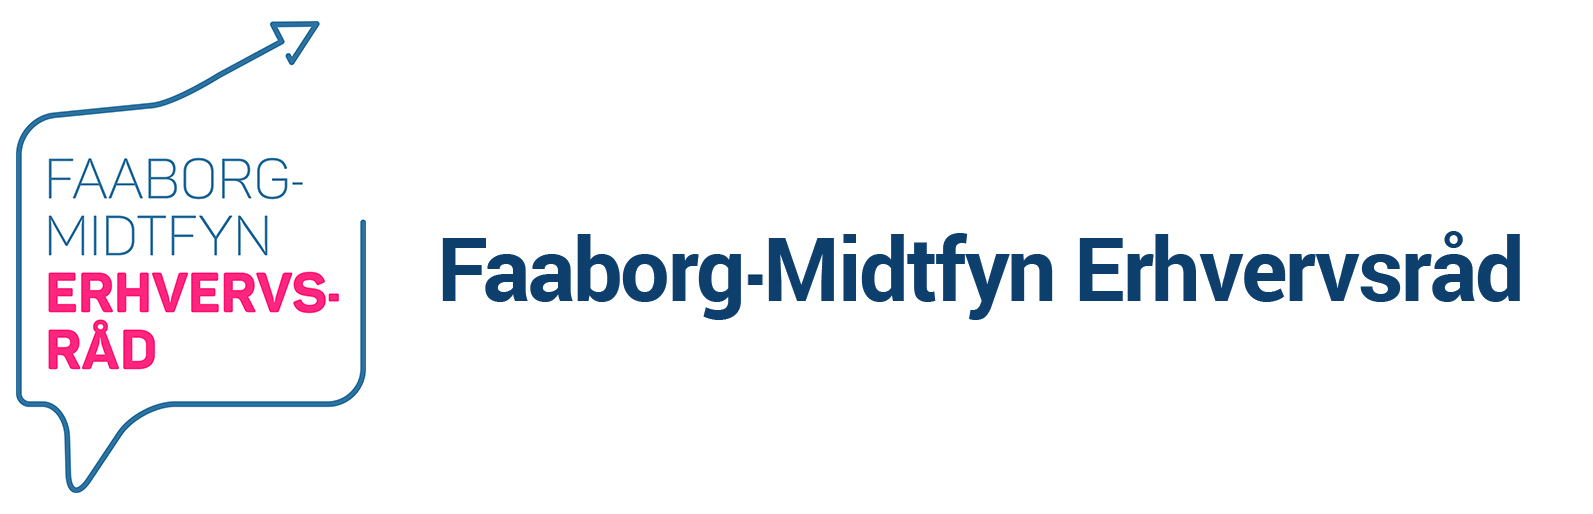 Faaborg-Midtfyn Erhvervsråd